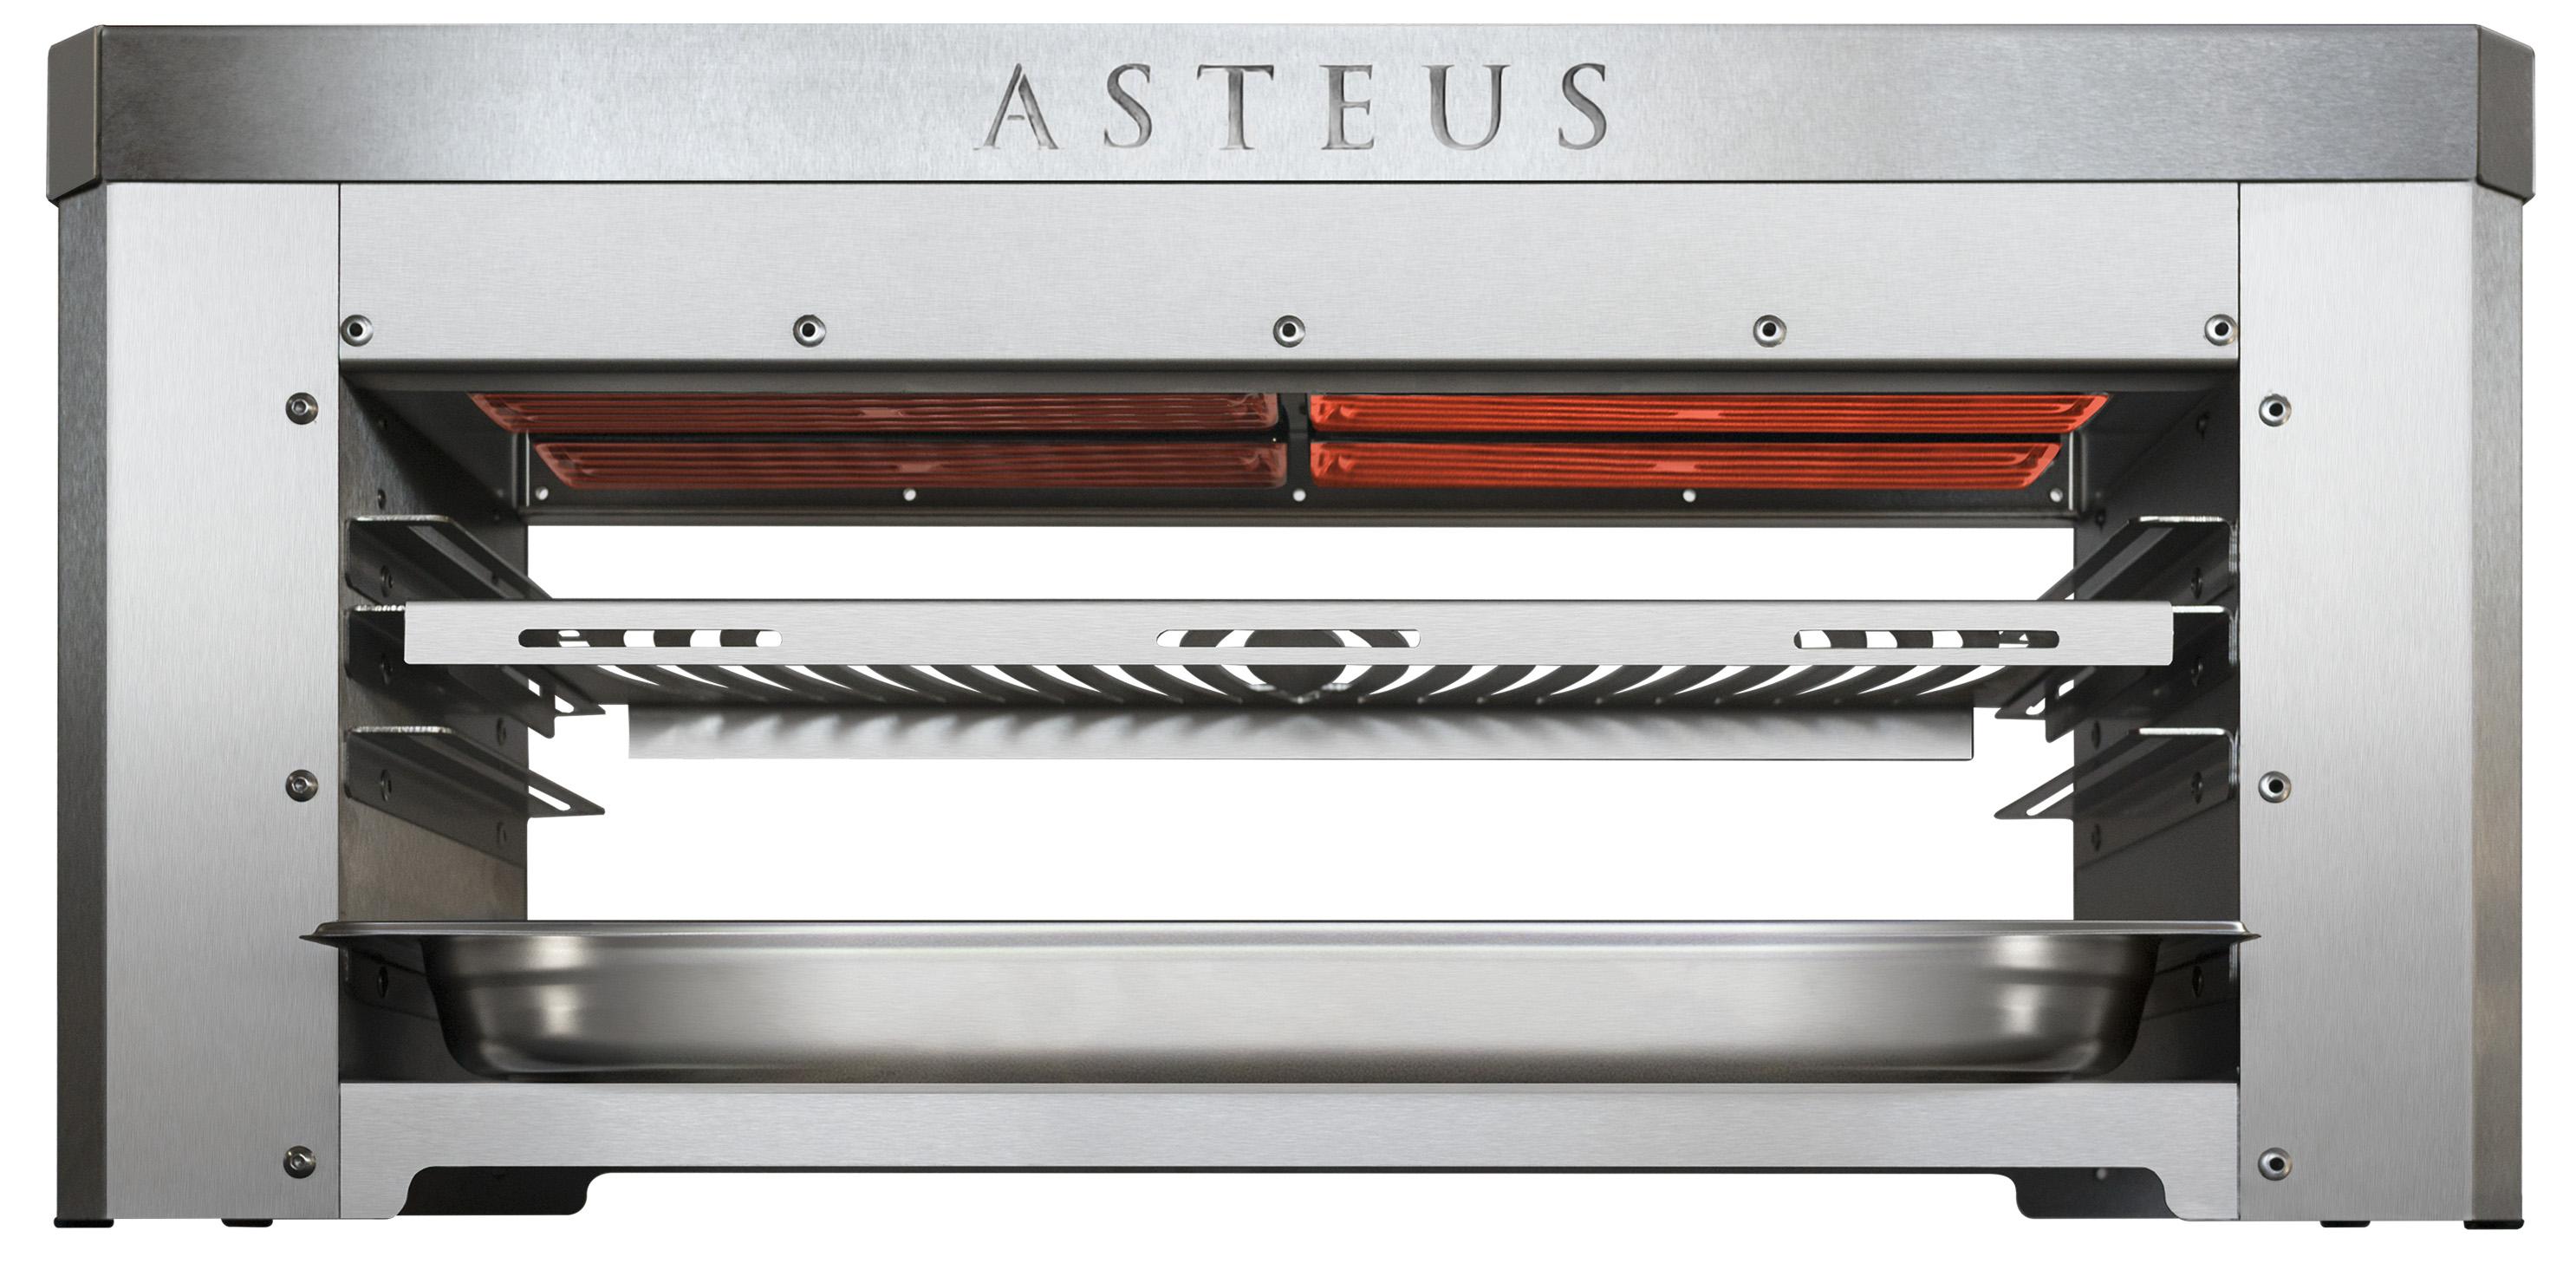 Asteus Family Infrarot Grill